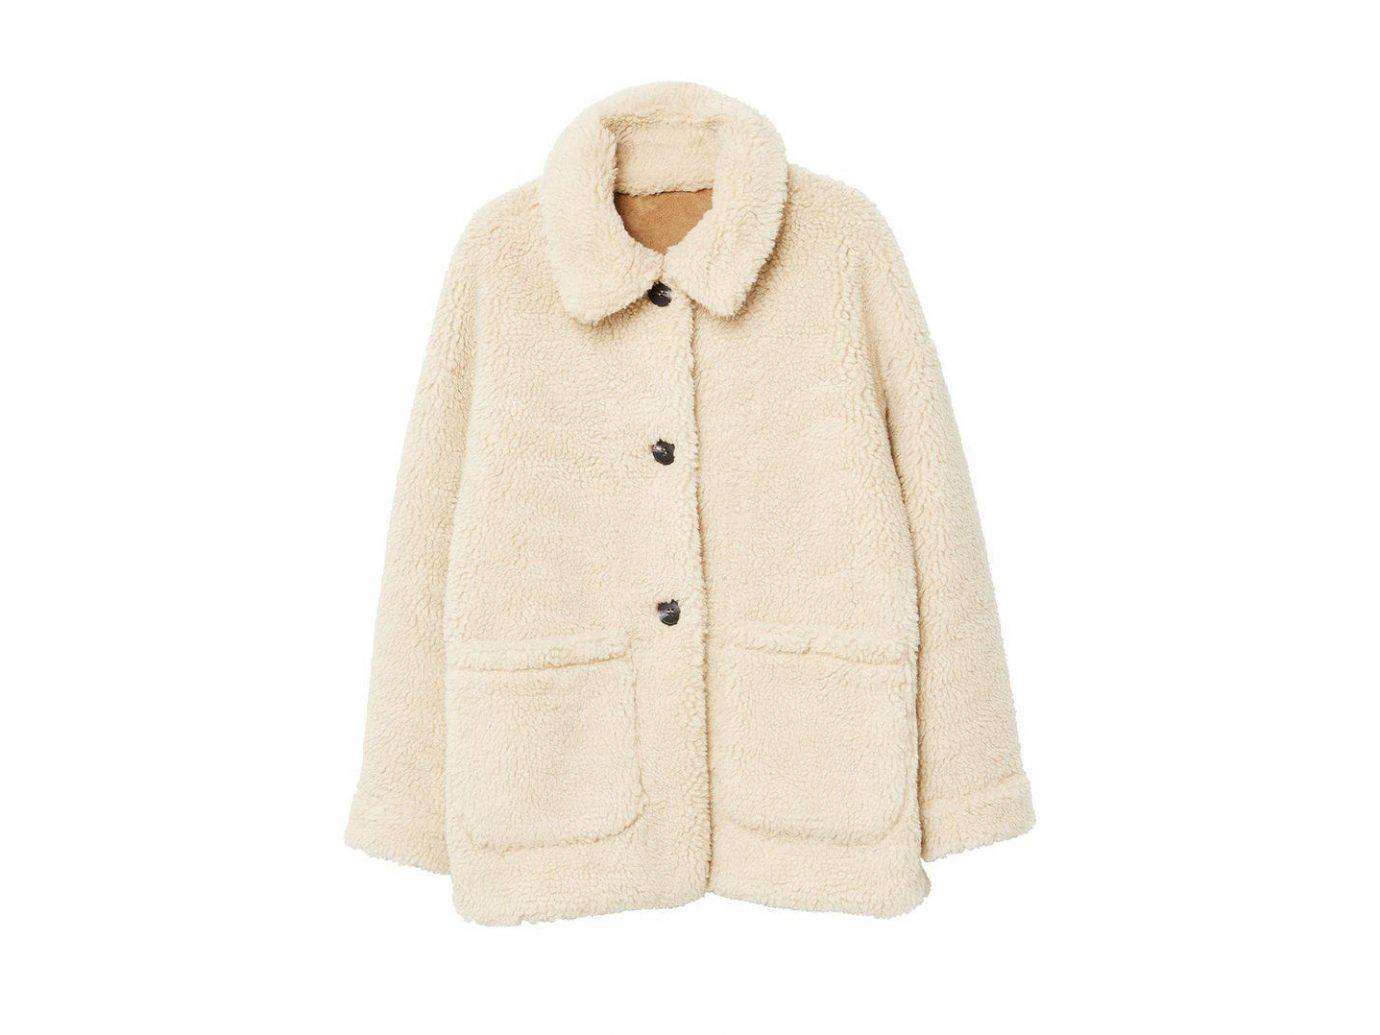 Style + Design Travel Shop coat fur clothing woolen wearing fur beige jacket sleeve overcoat tan